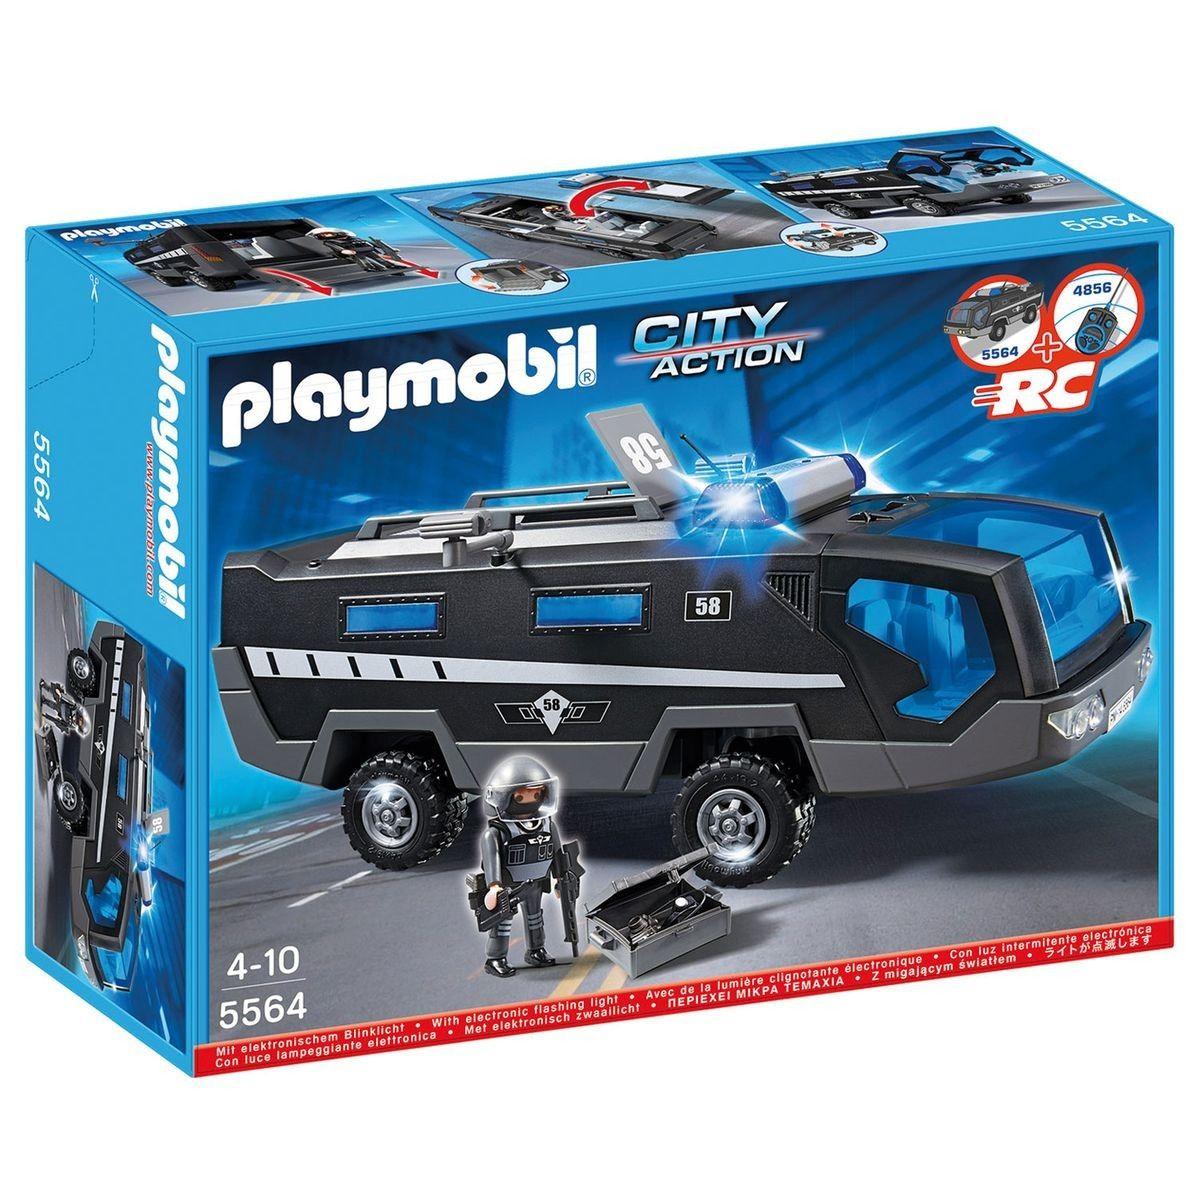 Playmobil Forces Action Spéciales City Véhicule D'intervention Des Y76bfgy